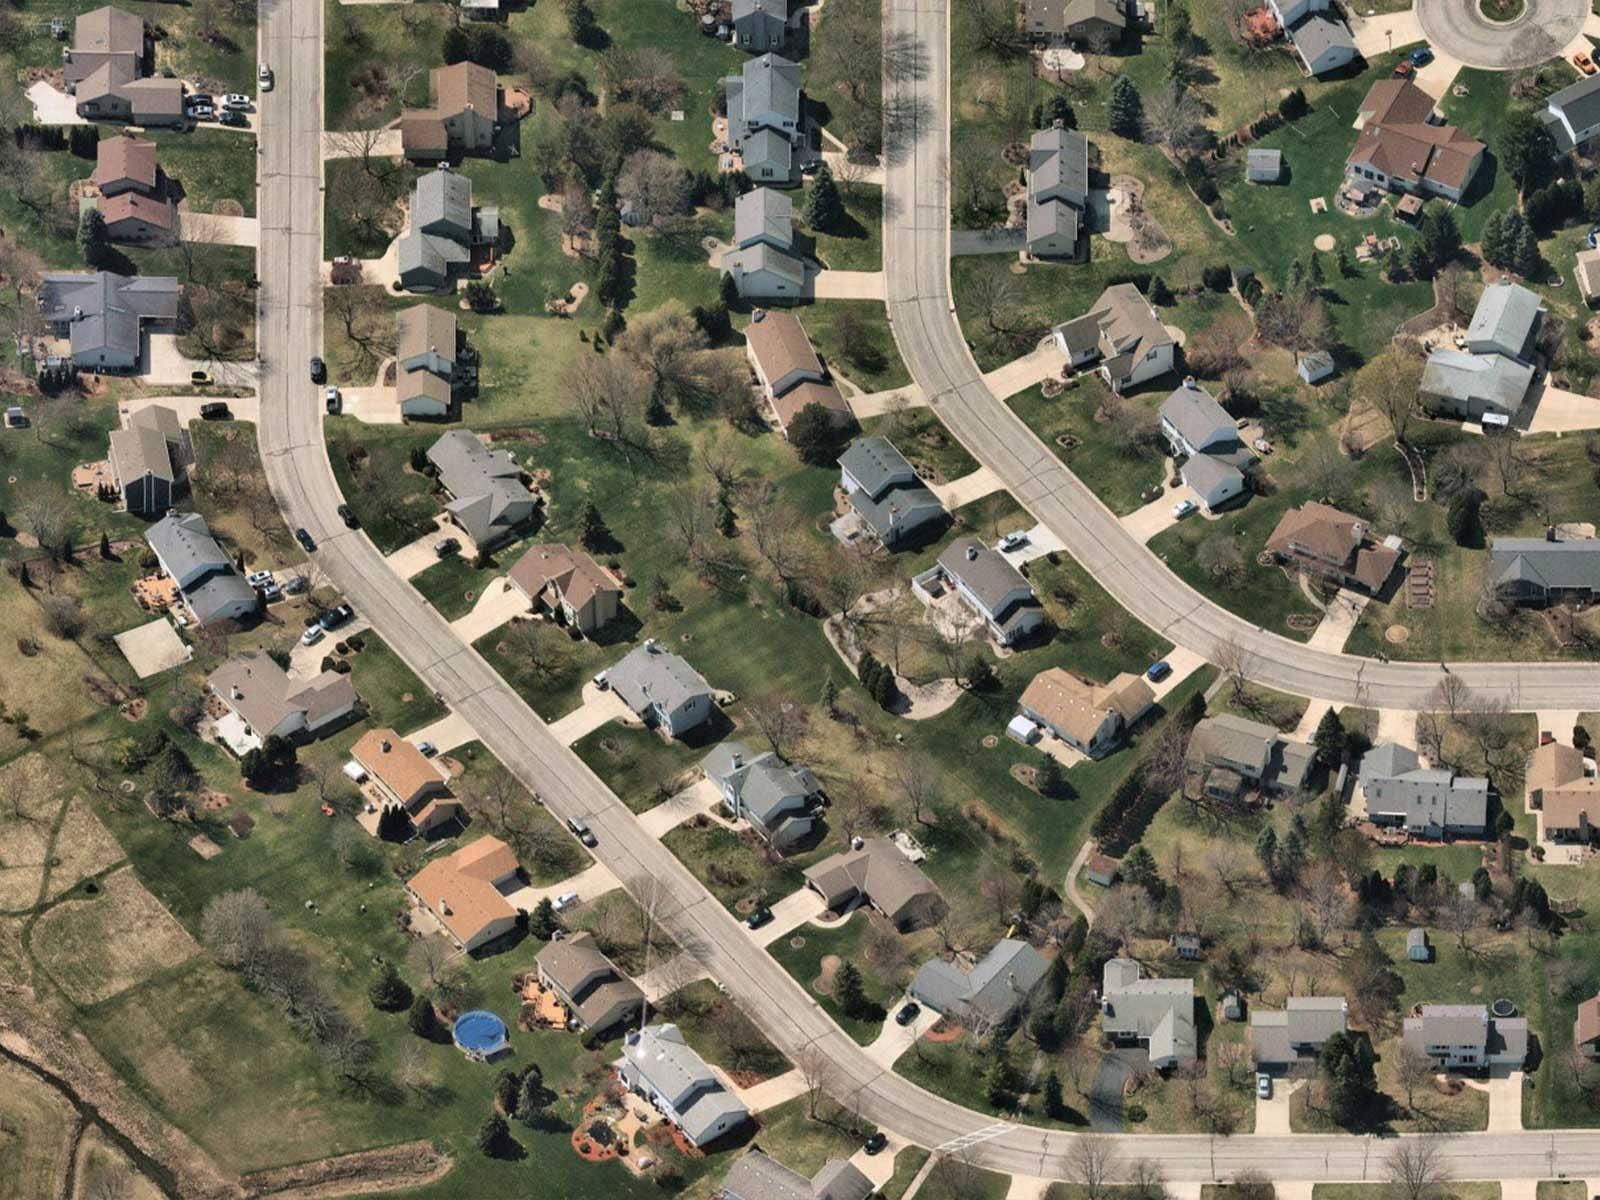 Oblique aerial image of suburban housing in Mequon, Wisconsin